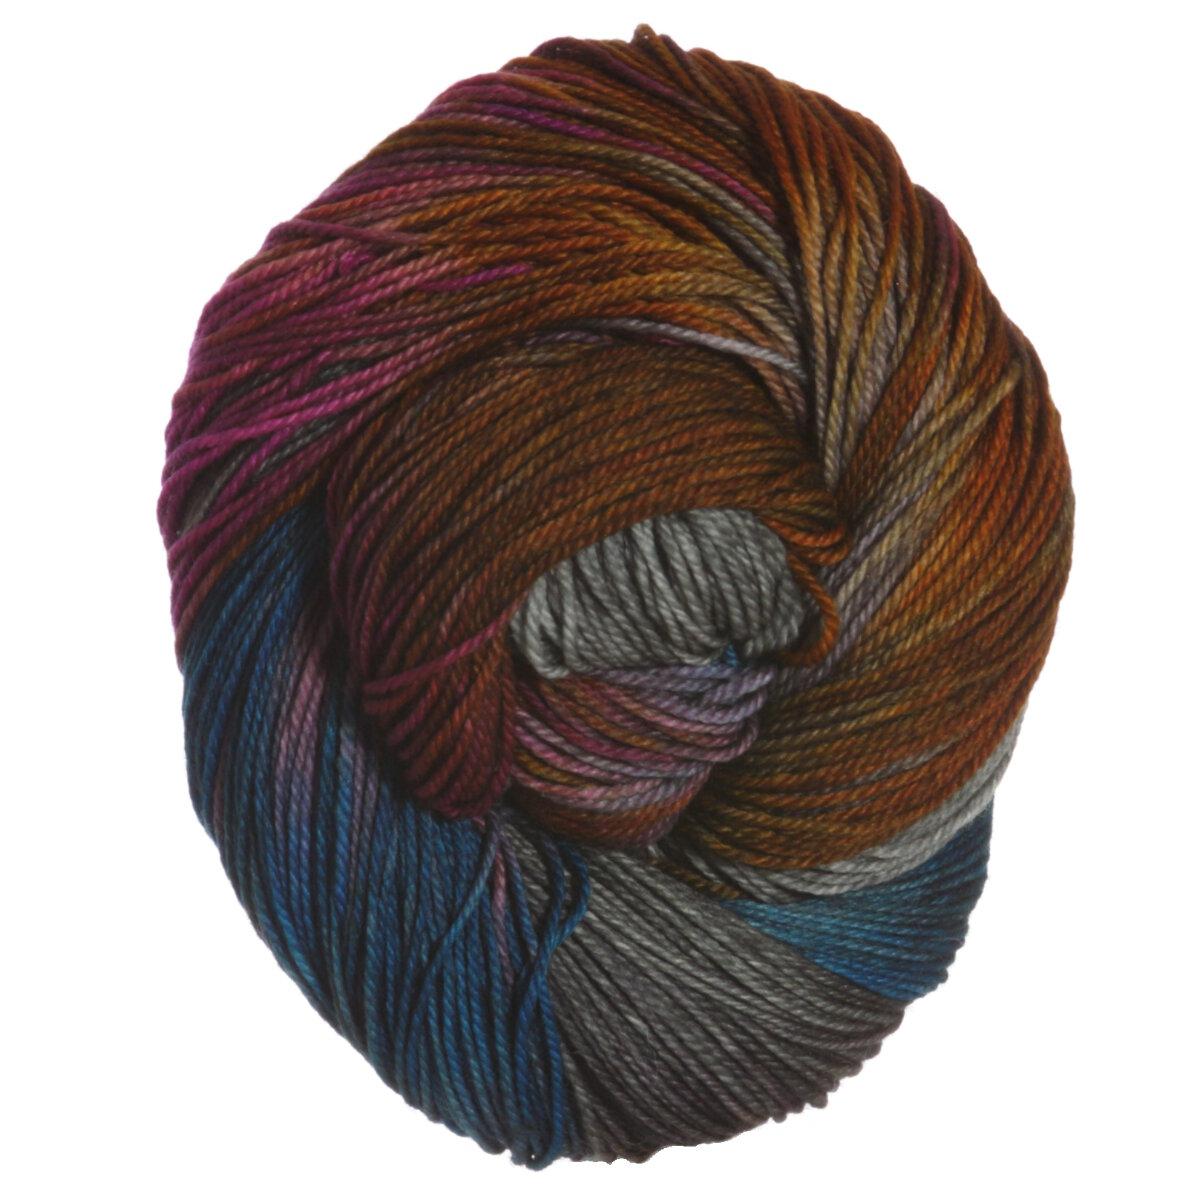 Knitting Yarn Fibers : Sweet fiber yarns super sock yarn knit night at